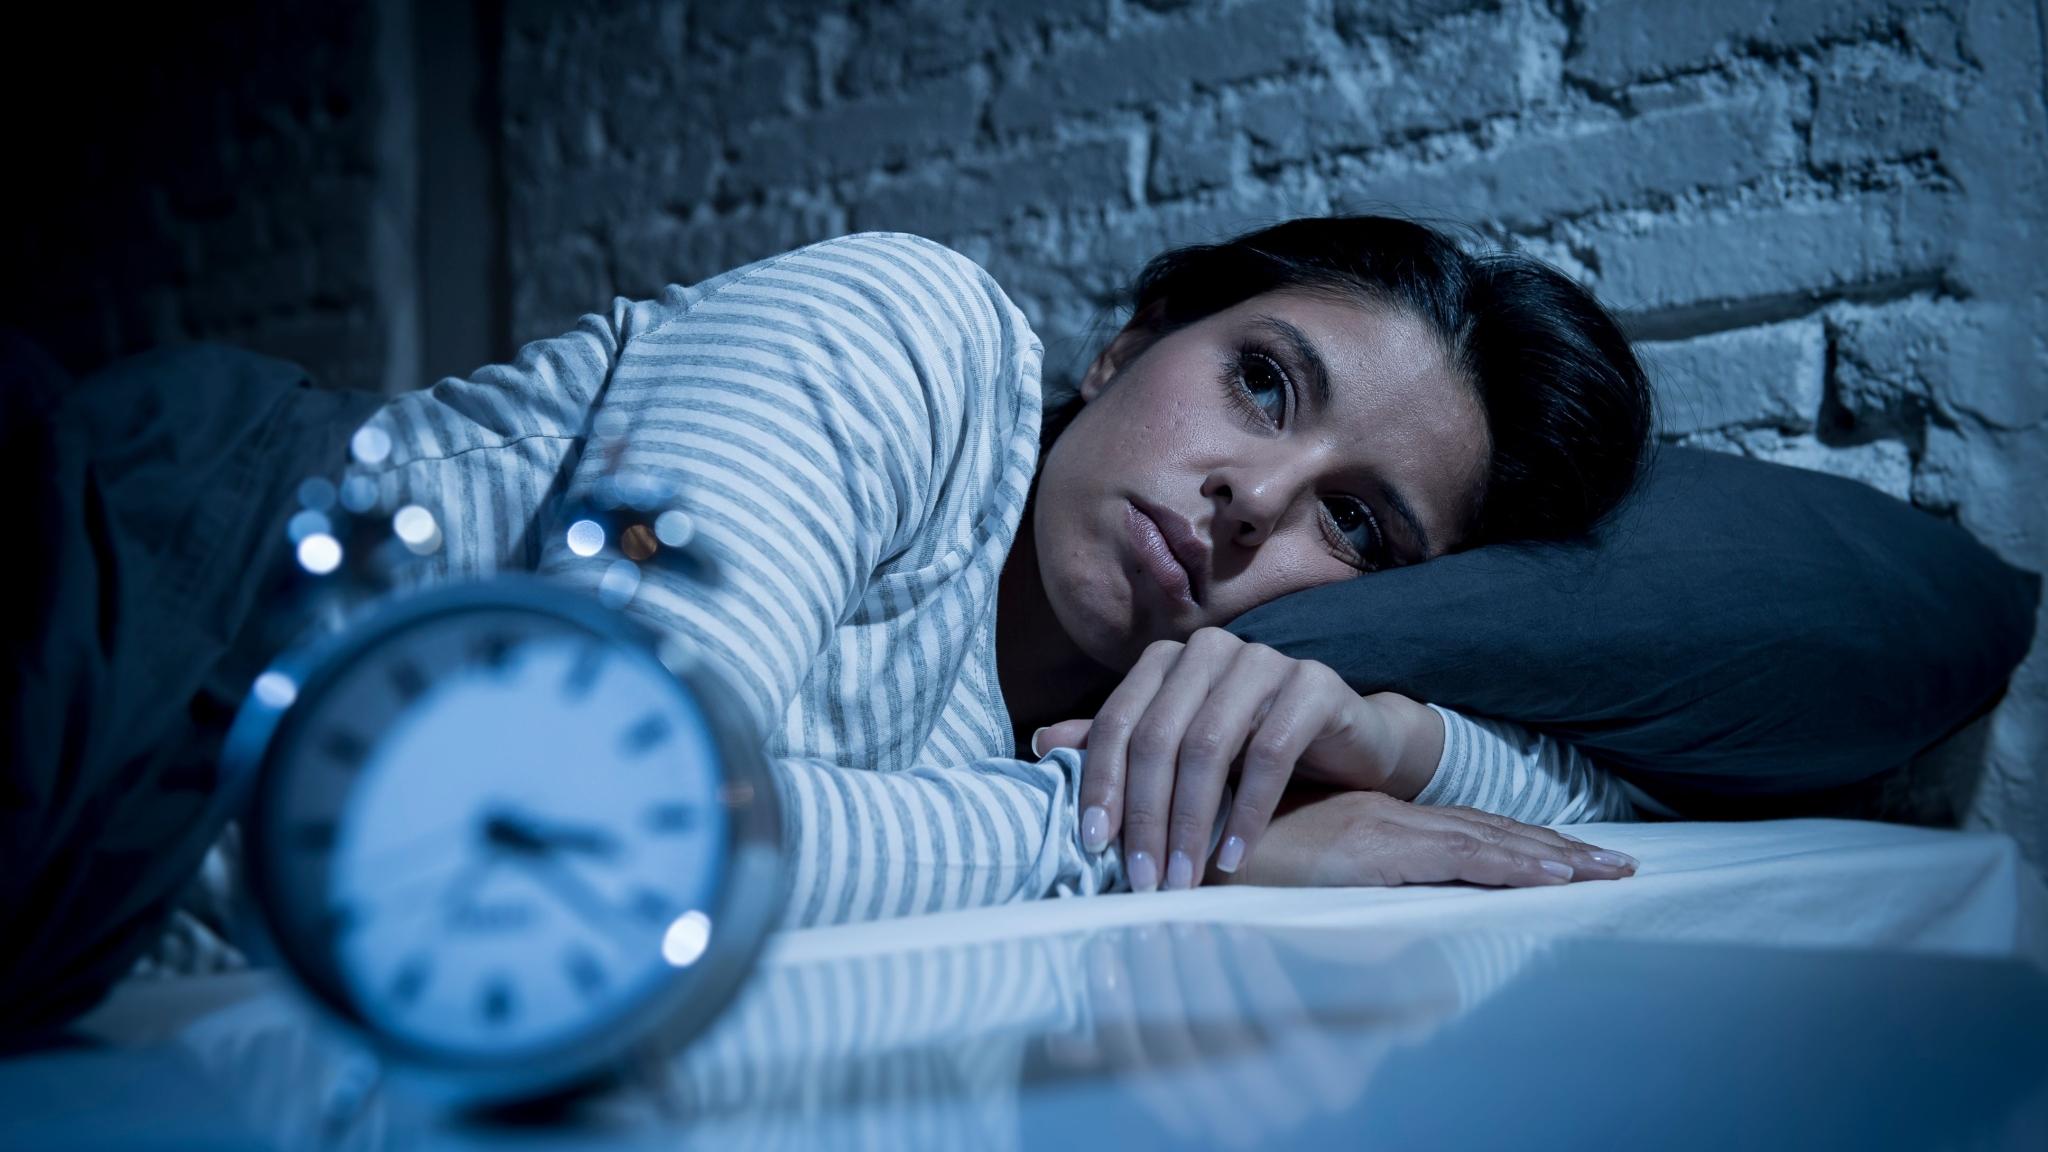 Sleep Disruption Can Lead to Imbalance and Falls, Says a Study